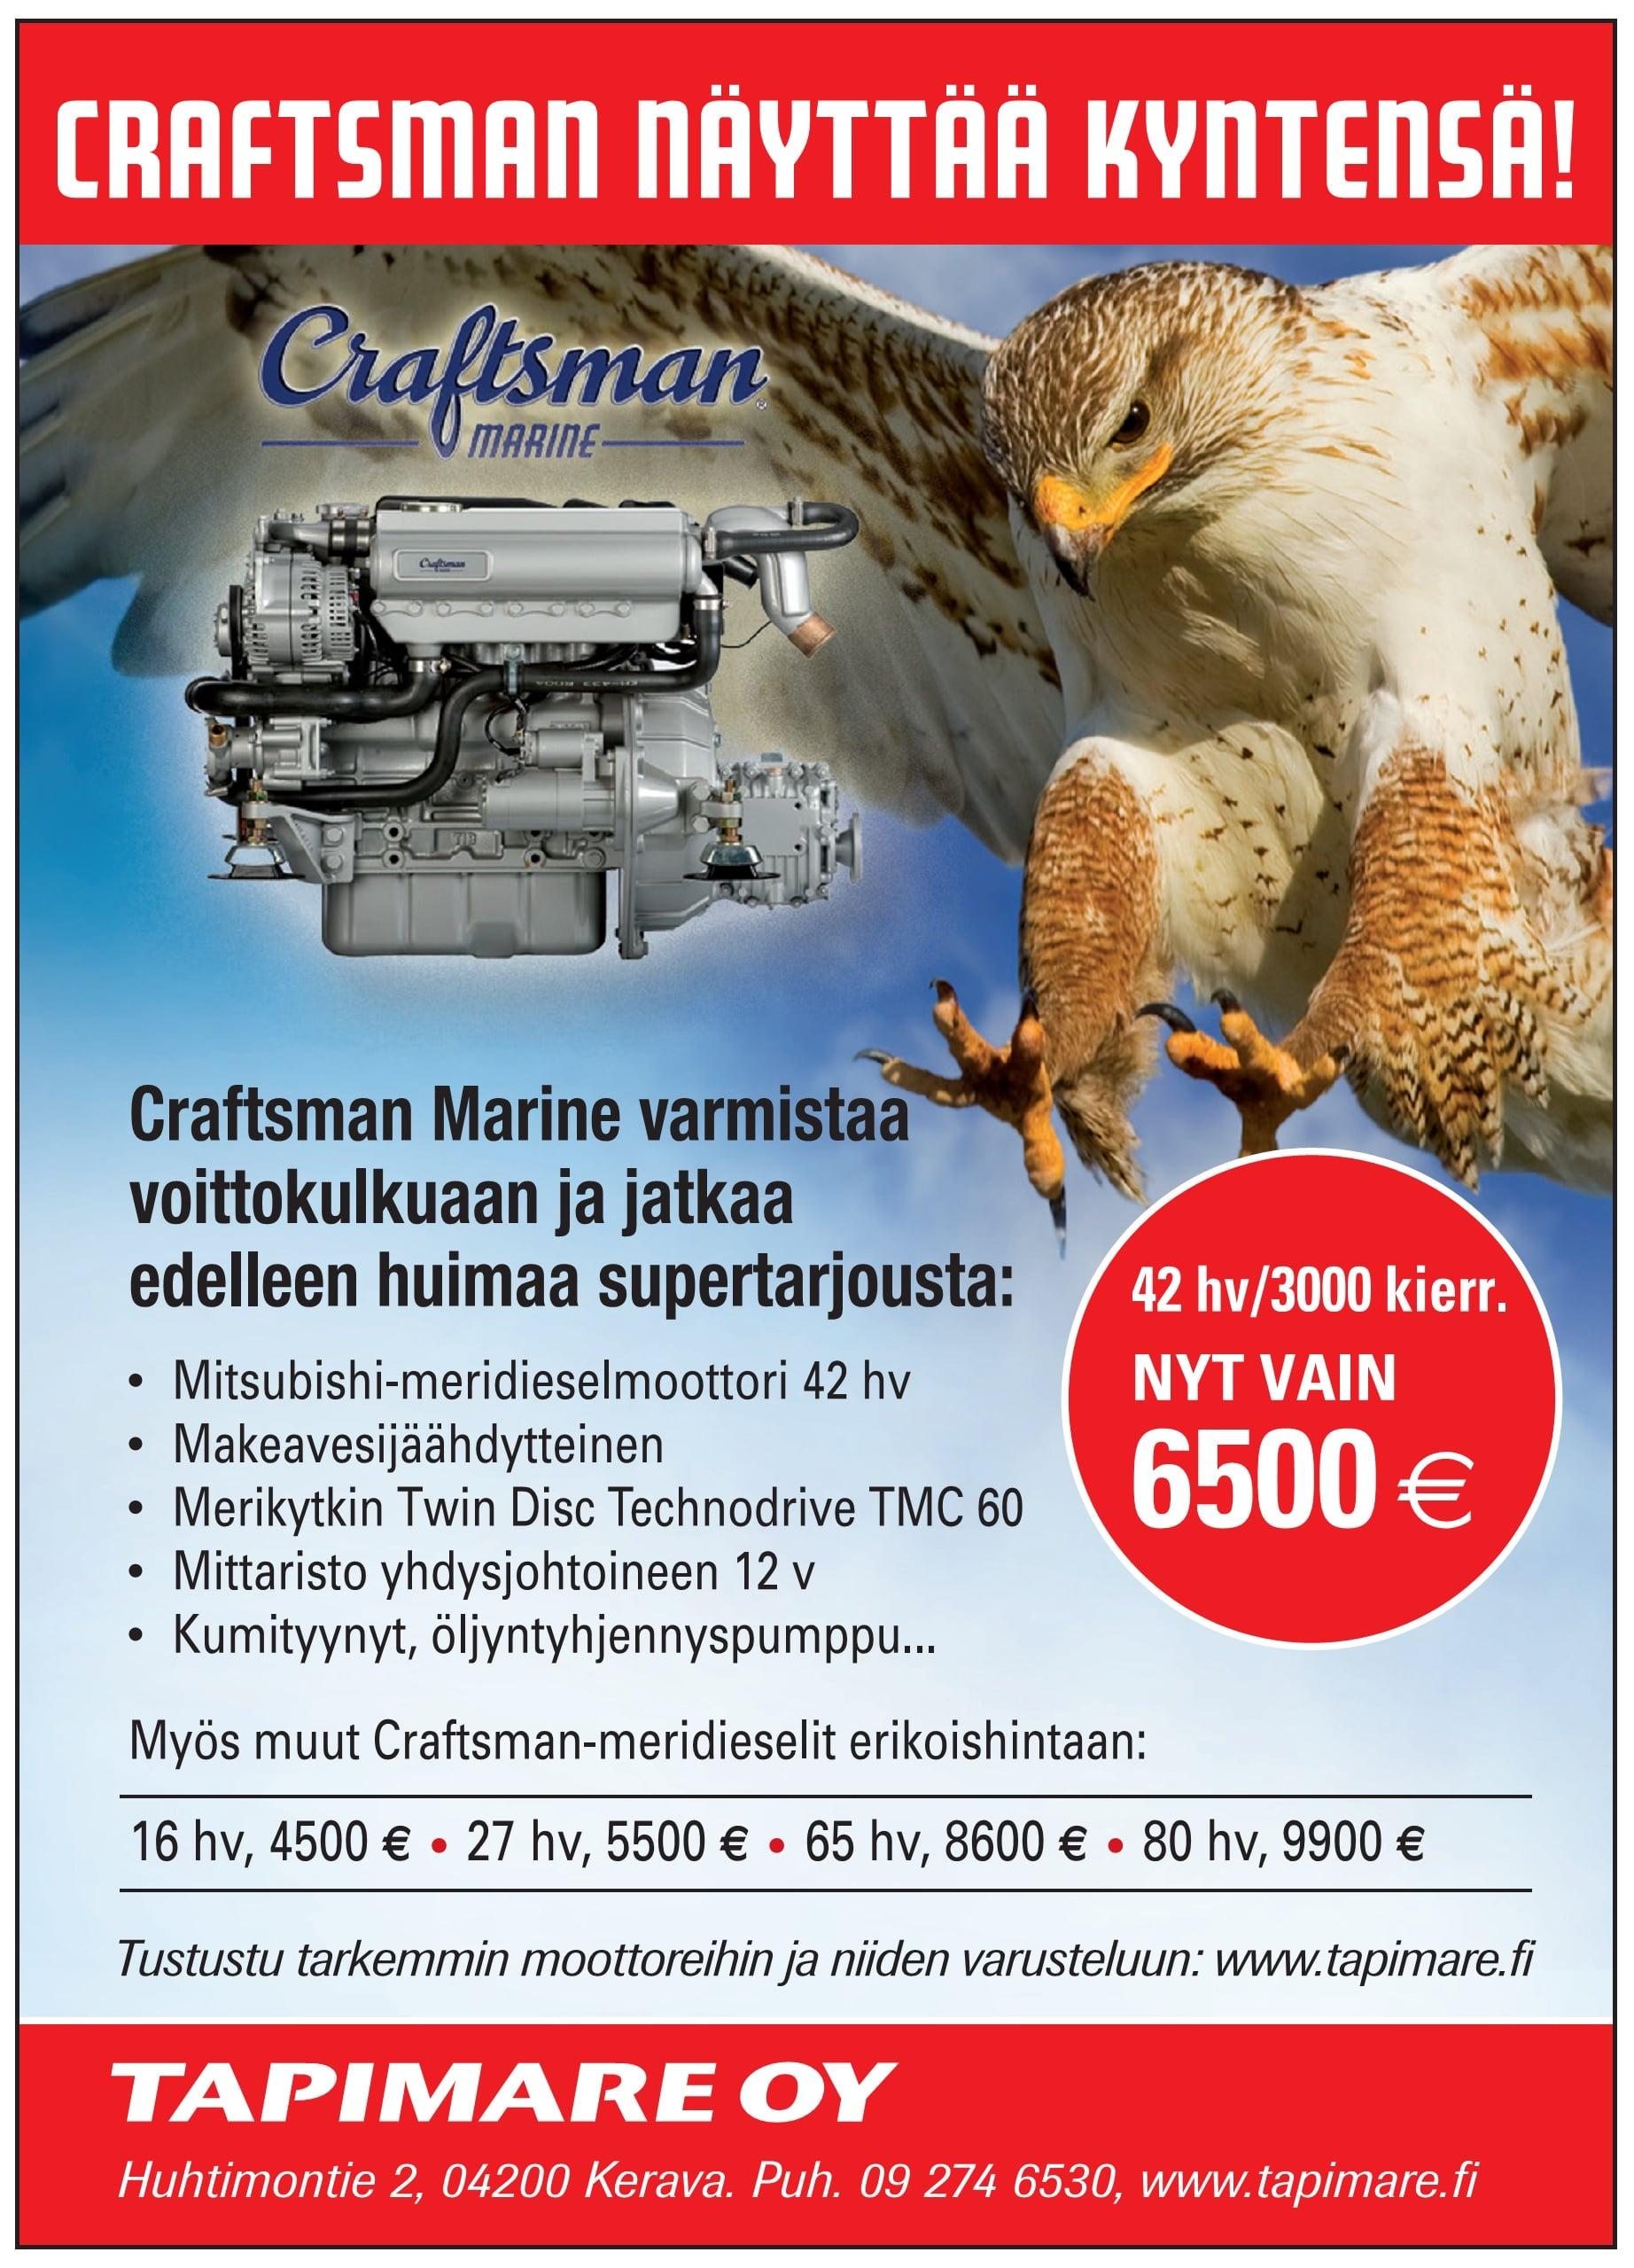 Craftsman 101016